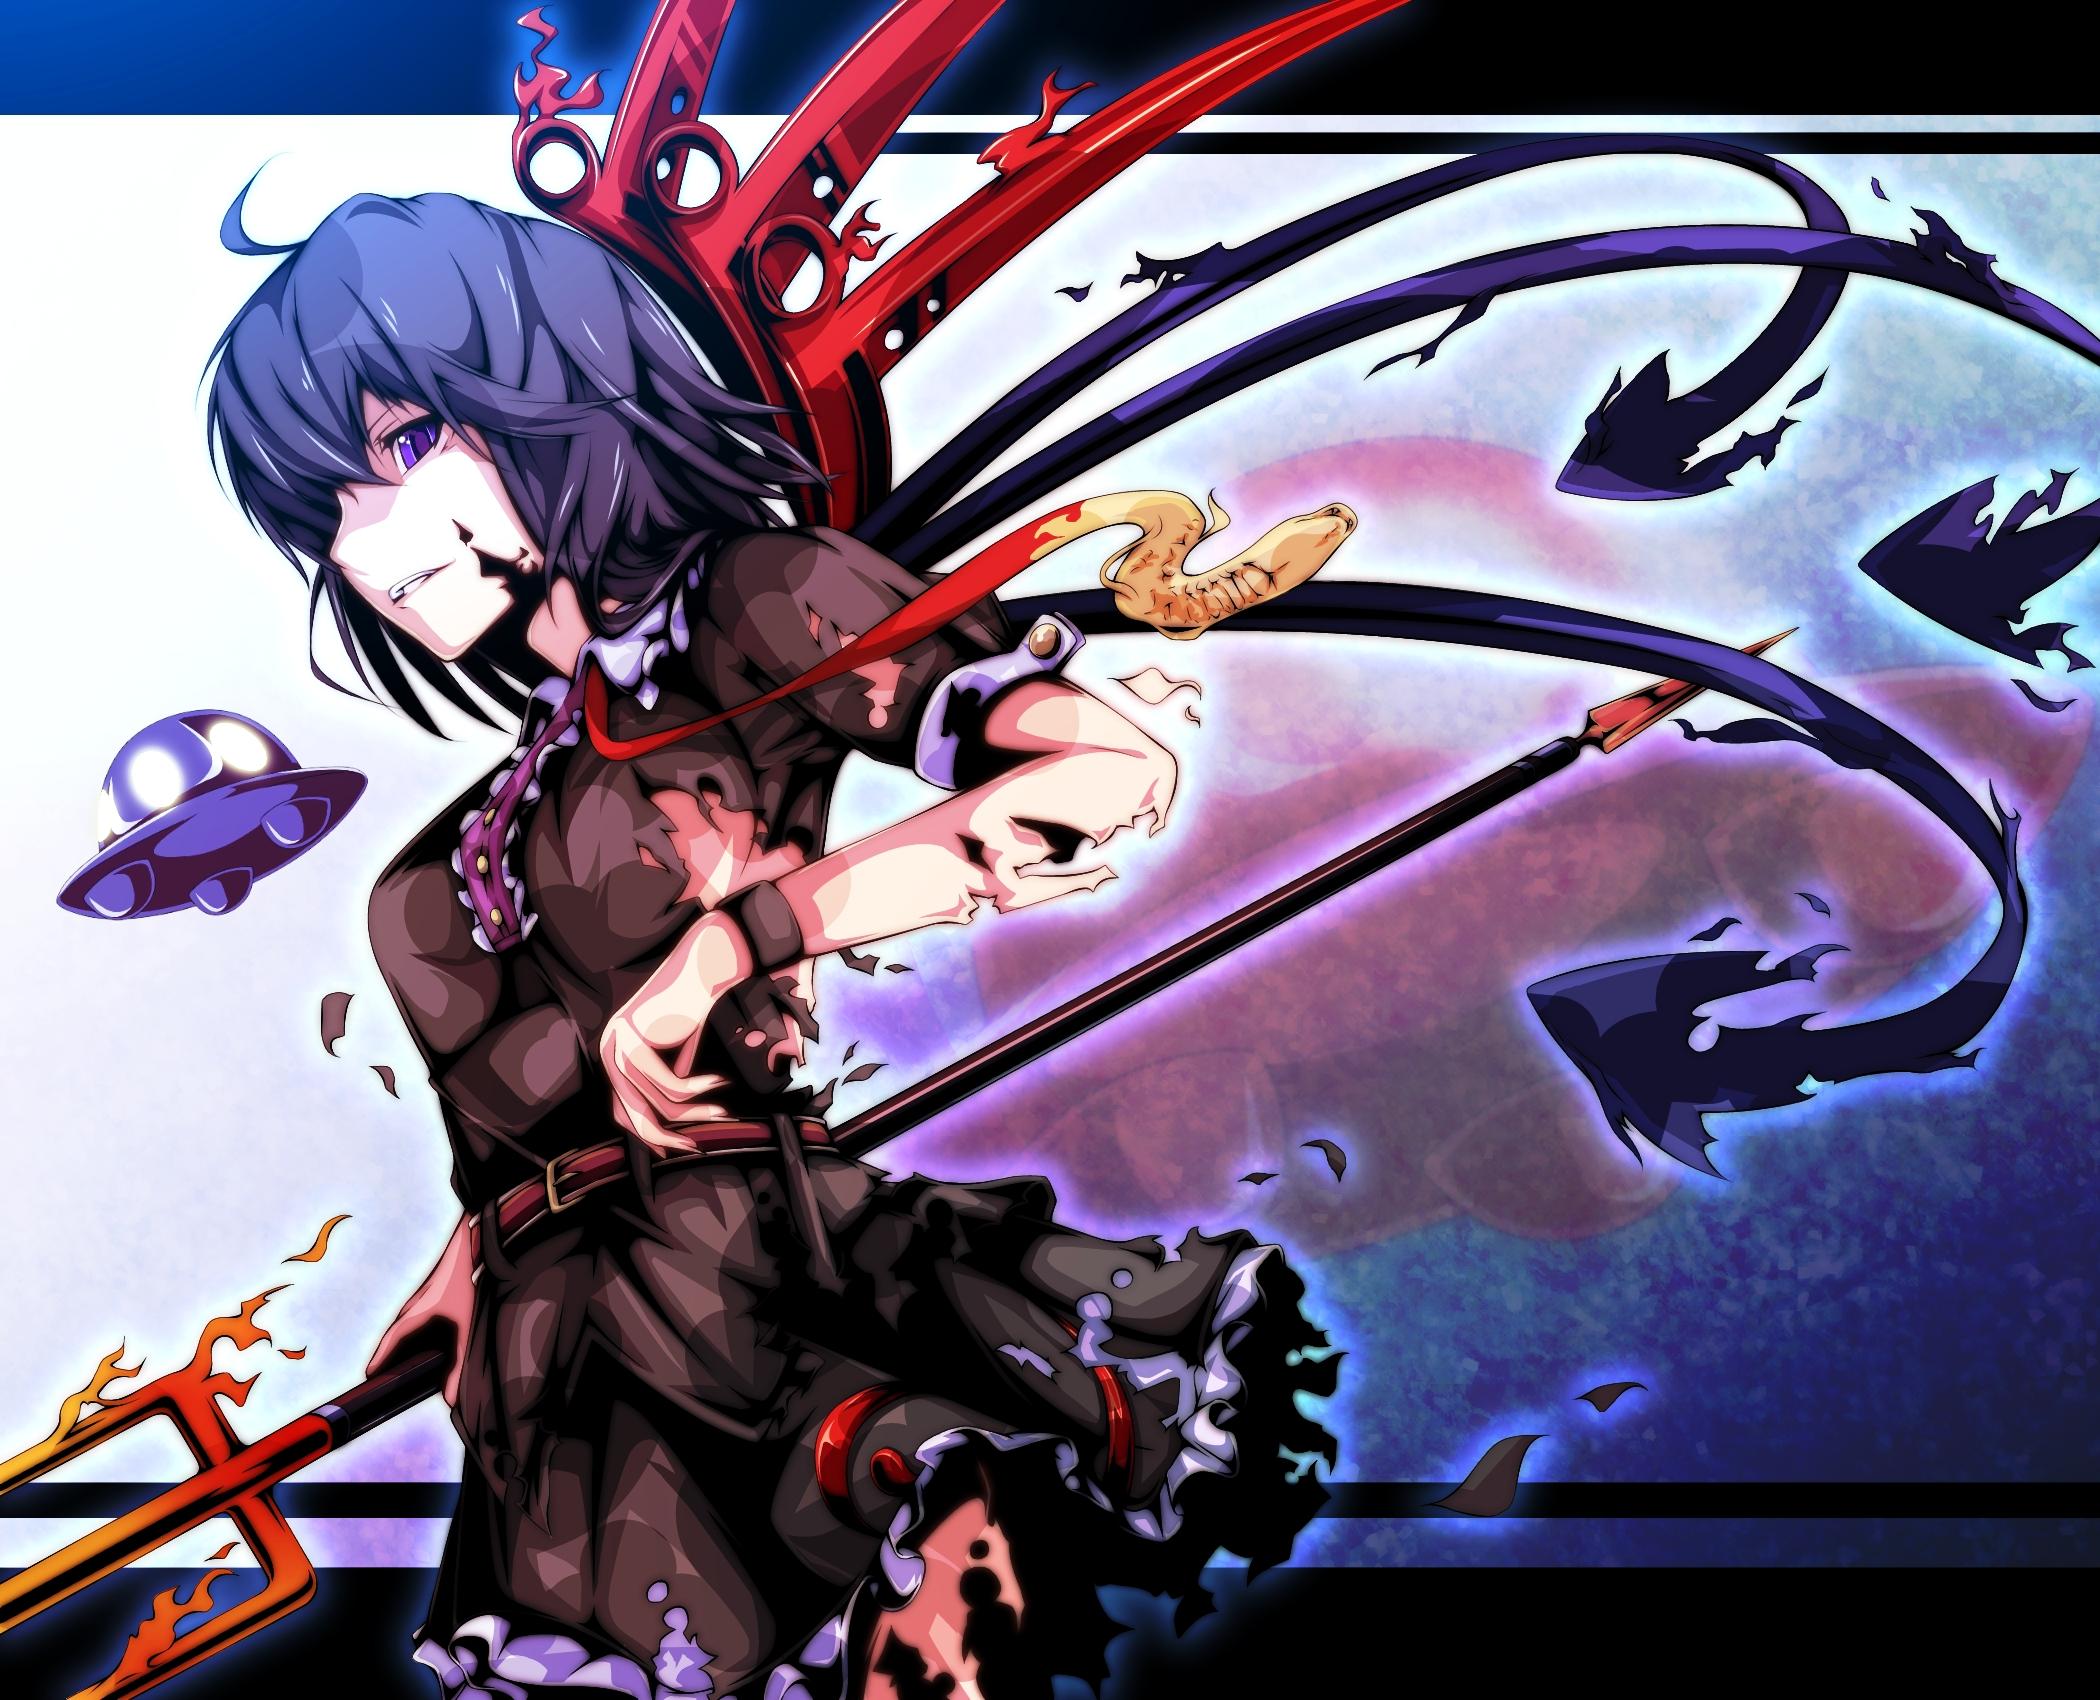 Houjuu Nue (Nue Houjuu) - Touhou - Zerochan Anime Image Board